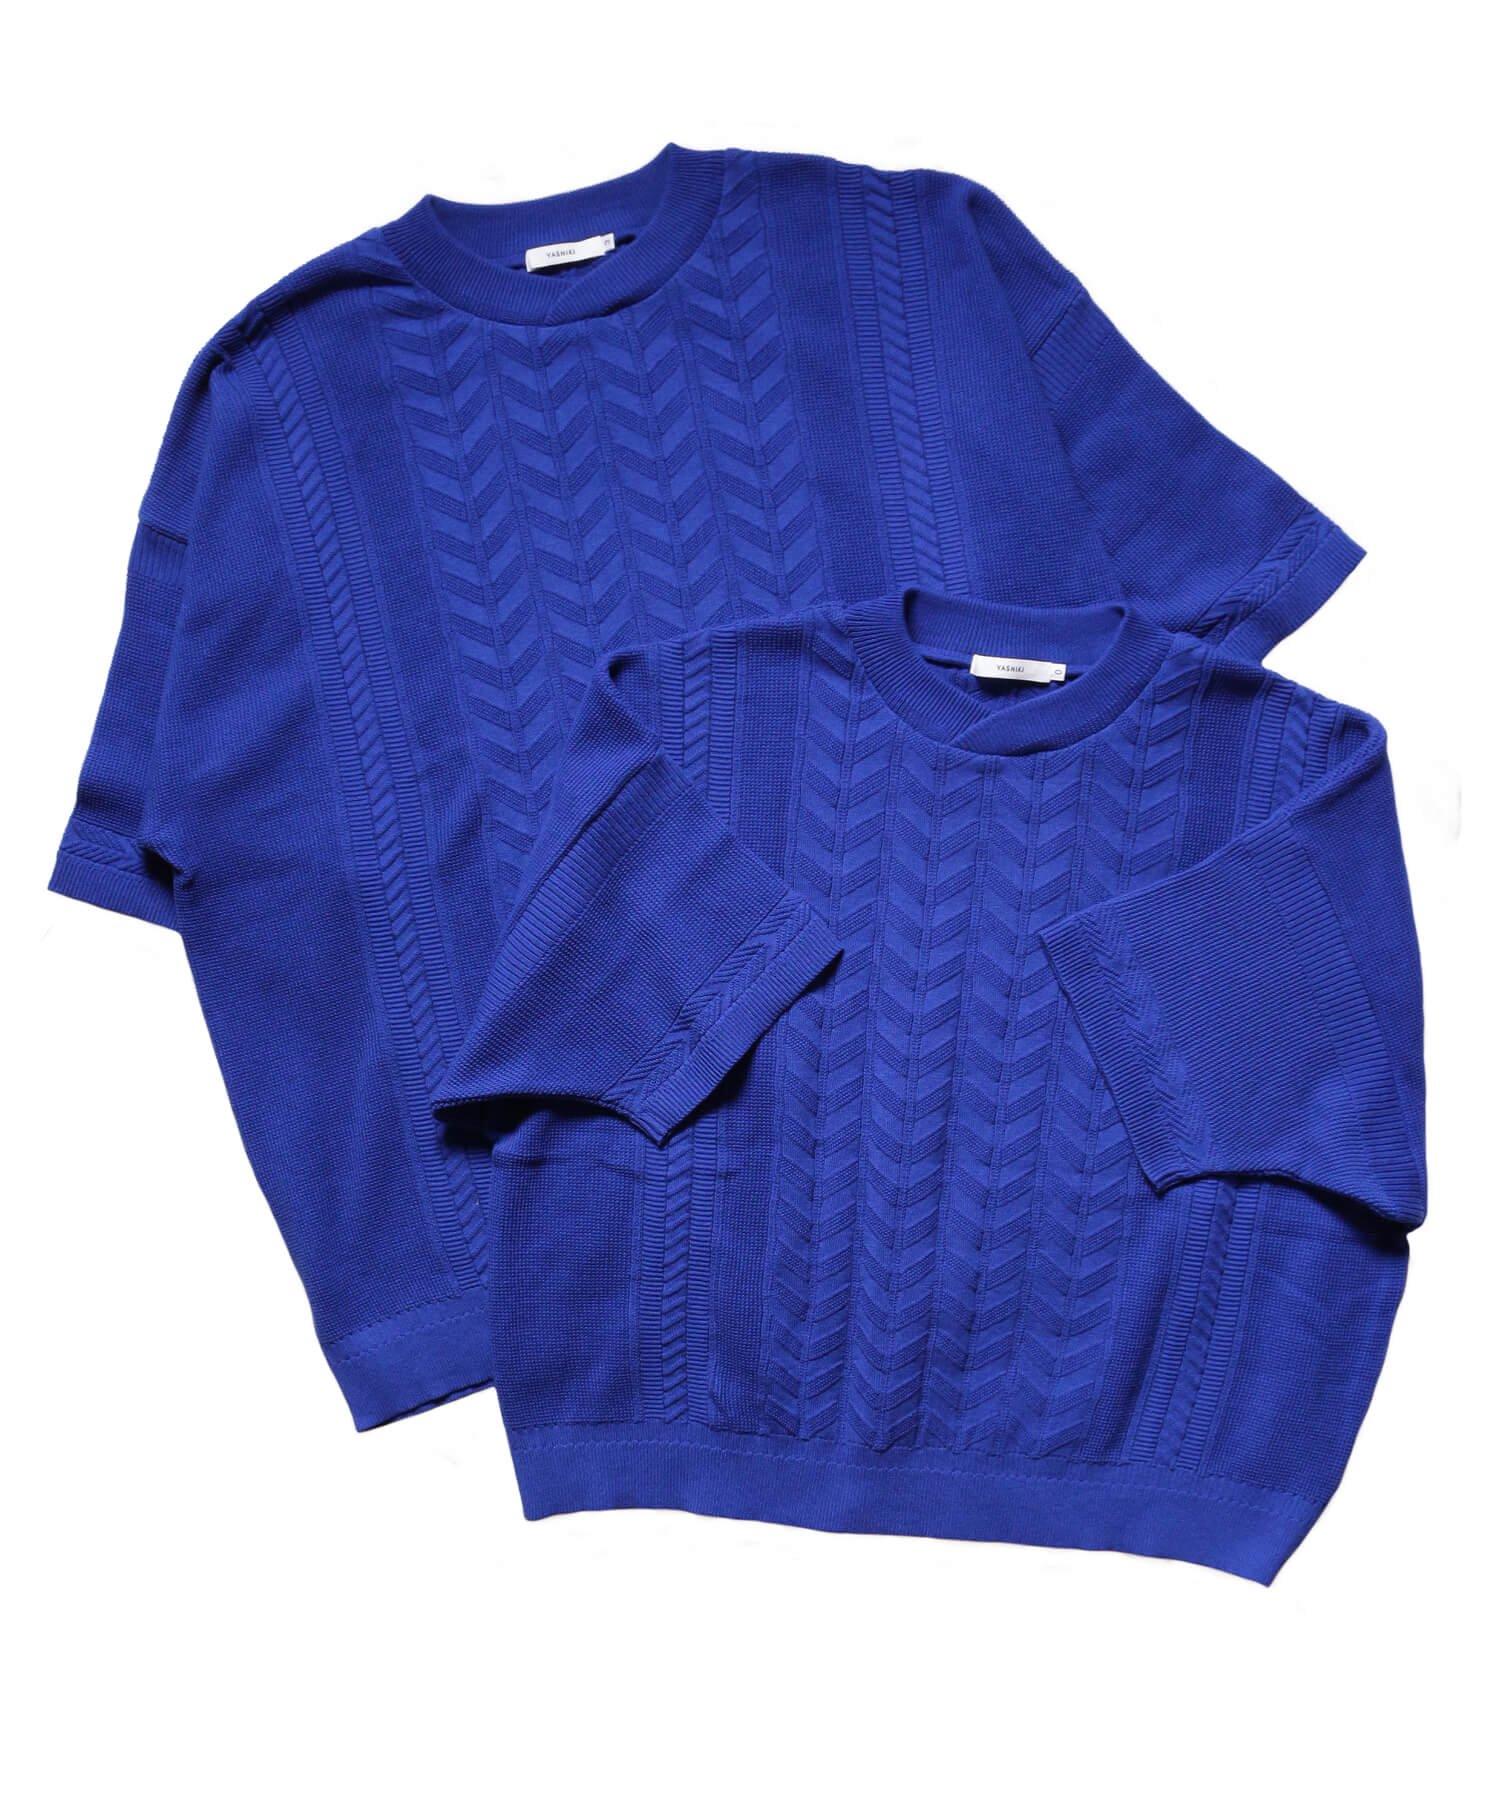 YASHIKI / ヤシキ |YASHIKI / ヤシキ × SIDEMILITIA inc. / サイドミリティア  RYUREI KNIT (LIMITED BLUE/WOMEN'S) 商品画像9